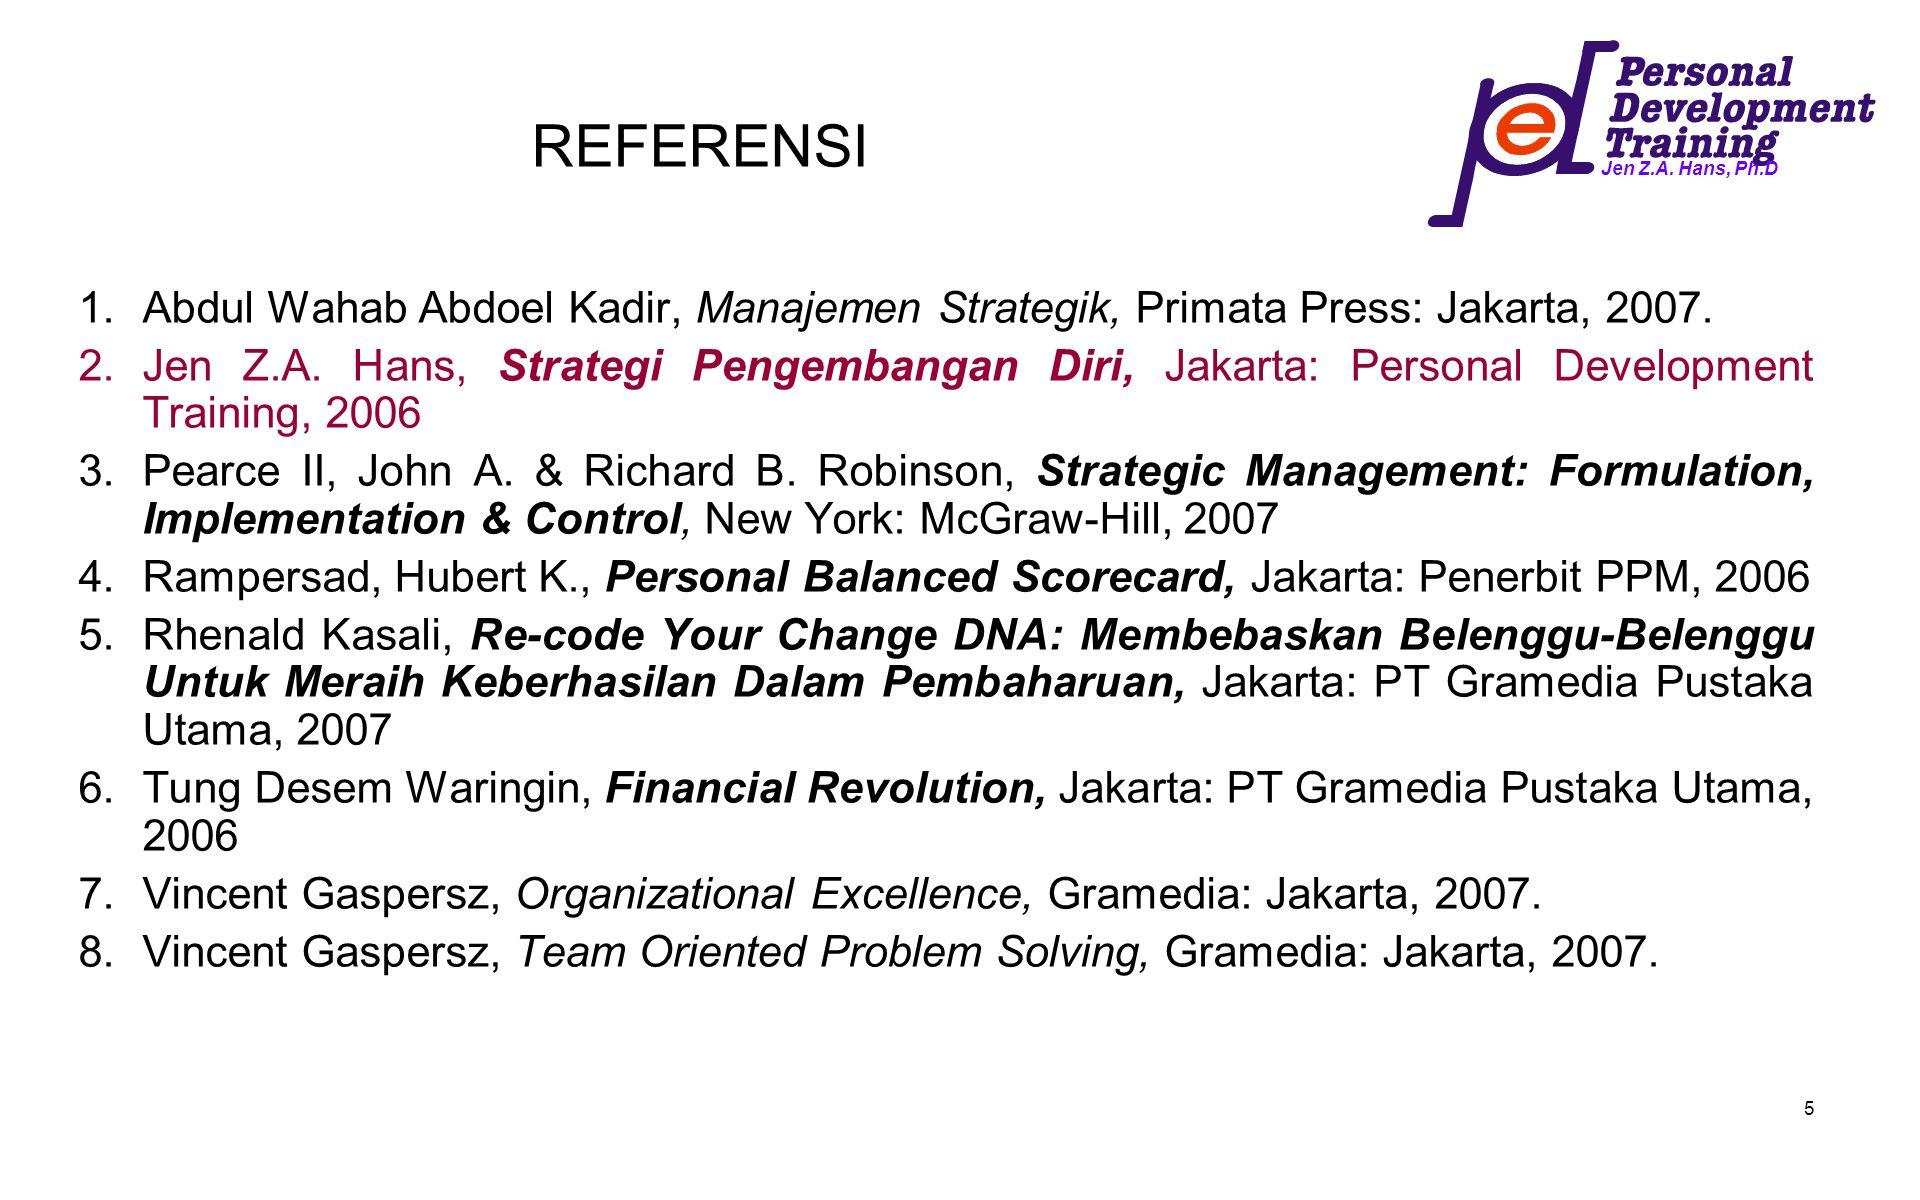 Jen Z.A. Hans, Ph.D 5 REFERENSI 1.Abdul Wahab Abdoel Kadir, Manajemen Strategik, Primata Press: Jakarta, 2007. 2.Jen Z.A. Hans, Strategi Pengembangan